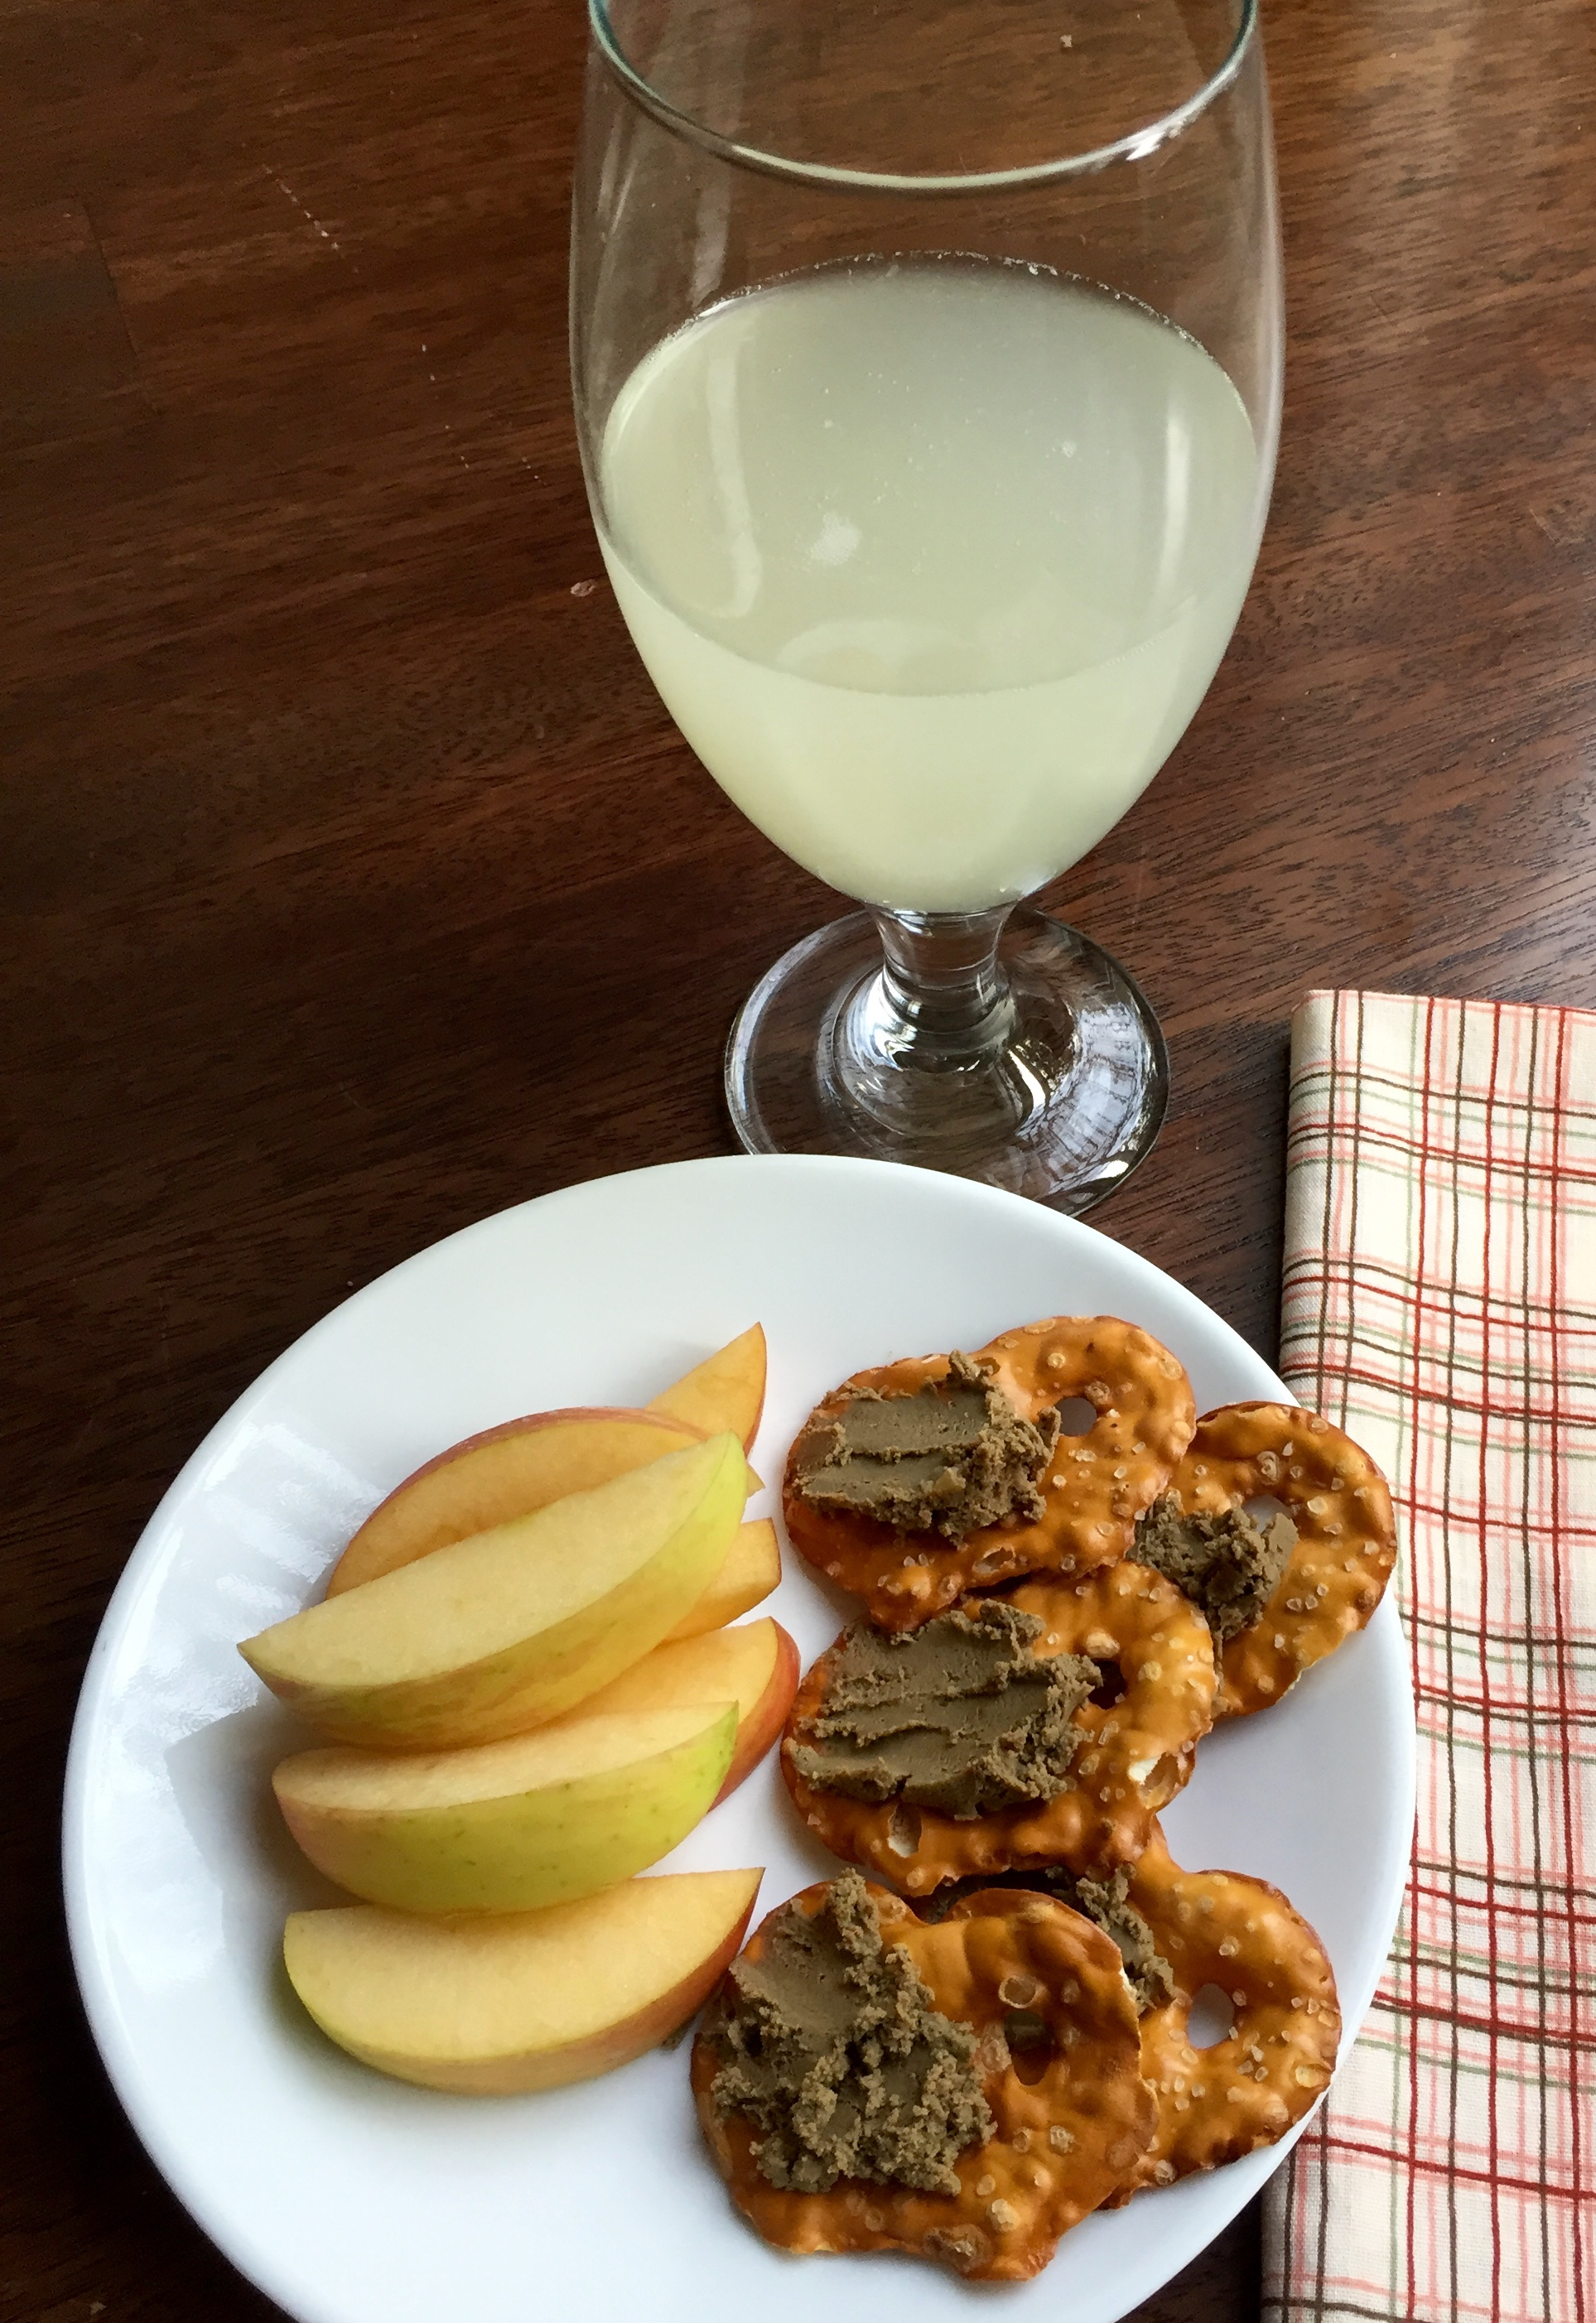 apples - pretzel chips with liver pate